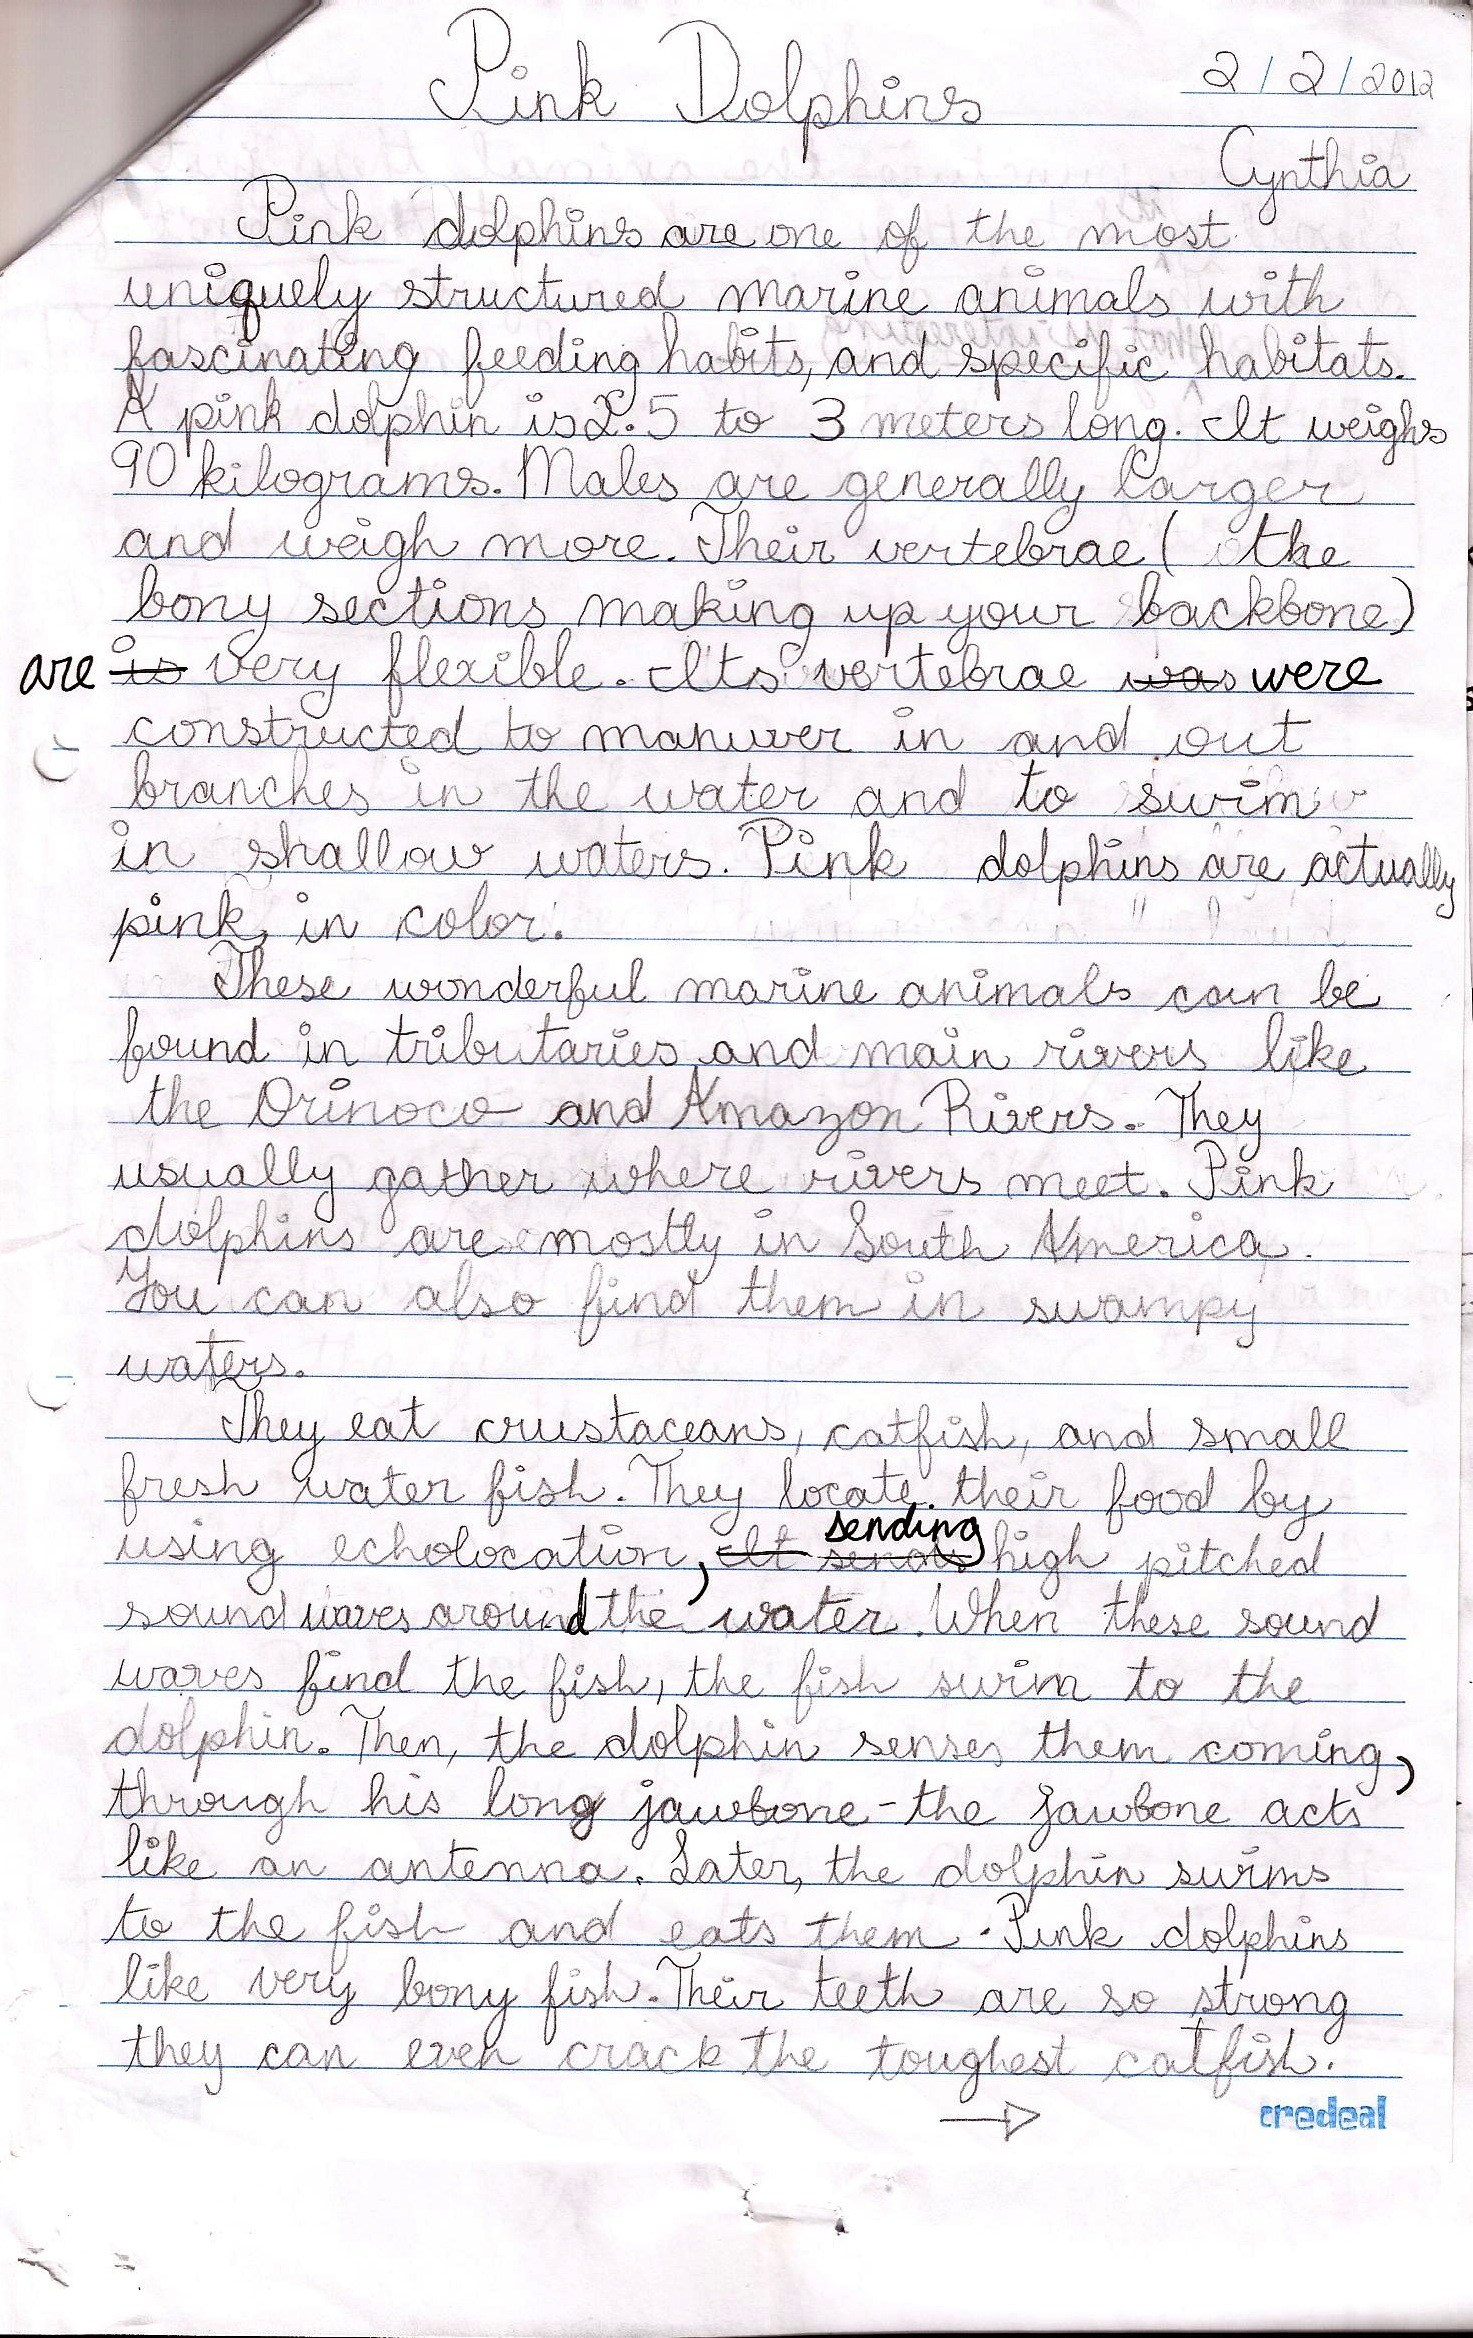 018 Persuasive Essay Rubric Example Pink Dolphins Handwritten Stunning Argumentative Grade 10 8th Doc Middle School Pdf Full